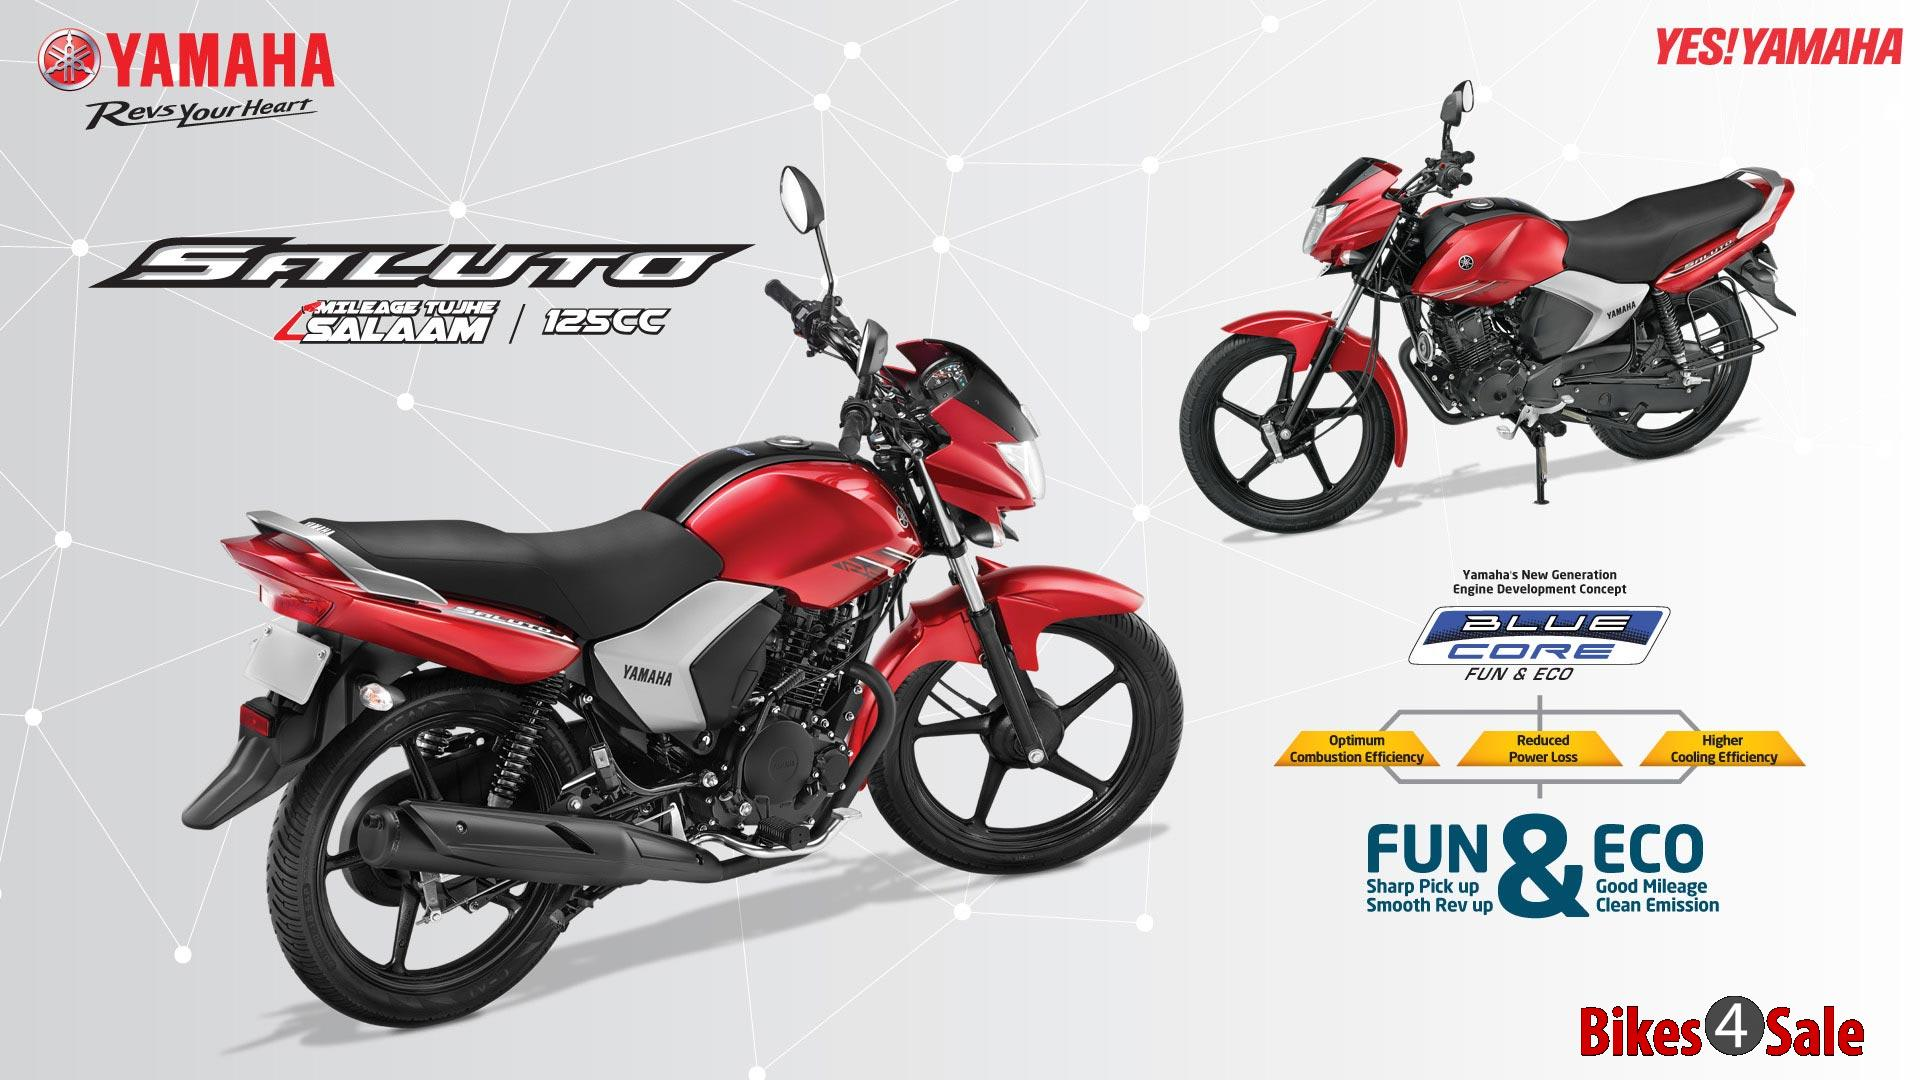 yamaha saluto 125 motorcycle picture gallery bikes4sale